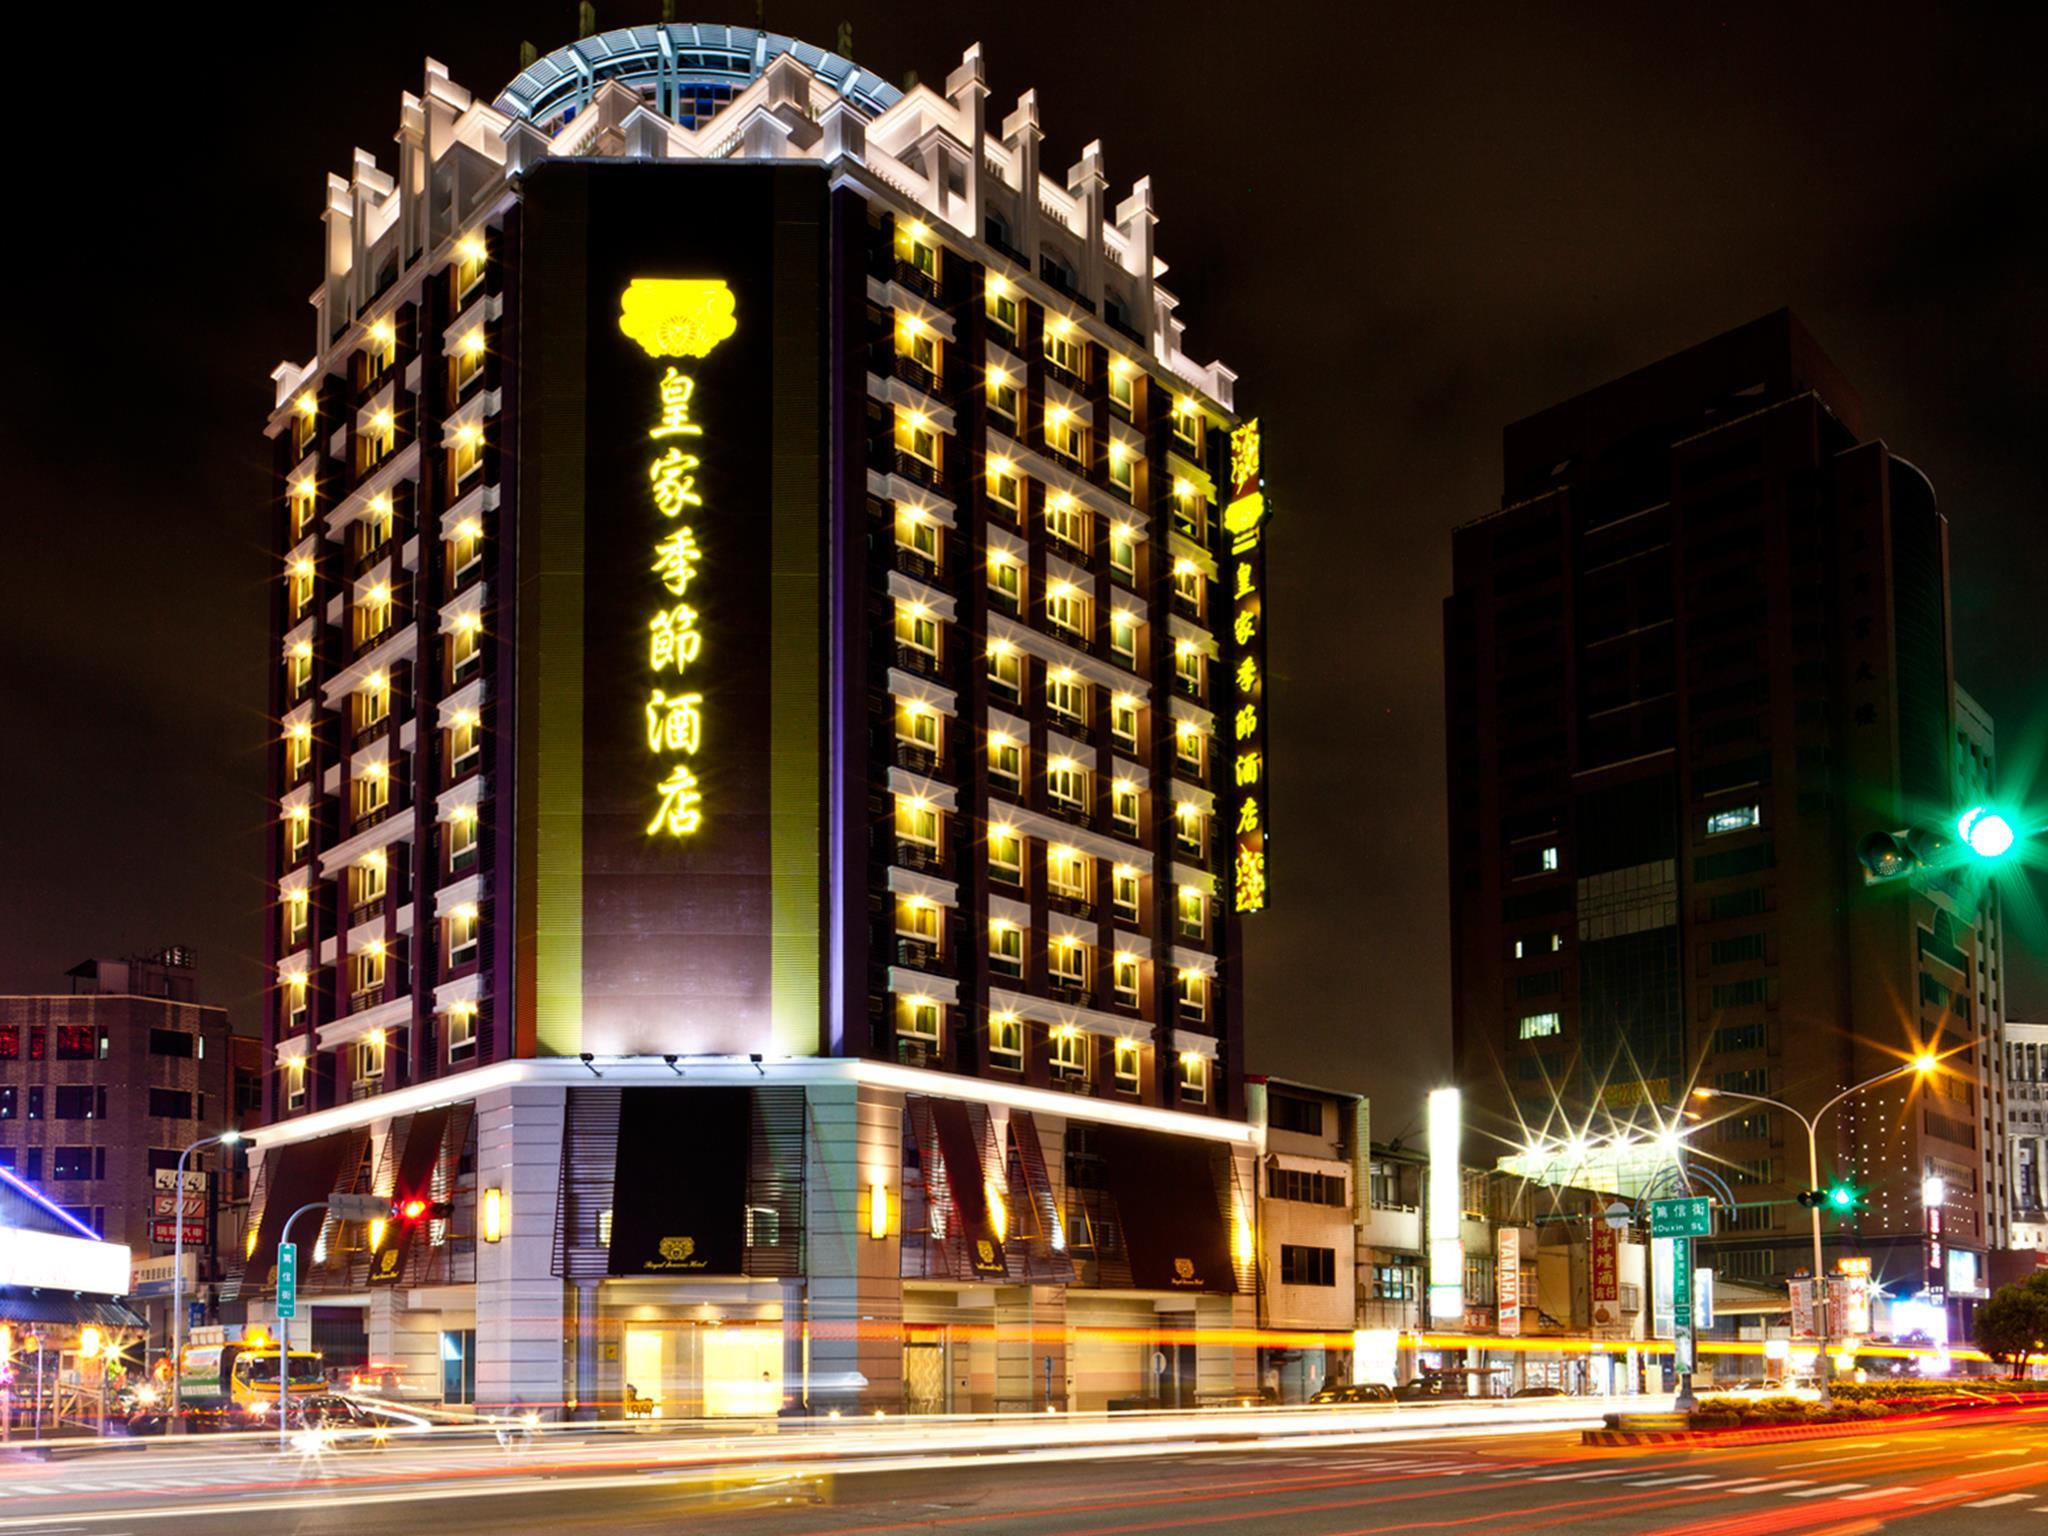 Royal Seasons Hotel Taichung-Zhongkang - Taichung